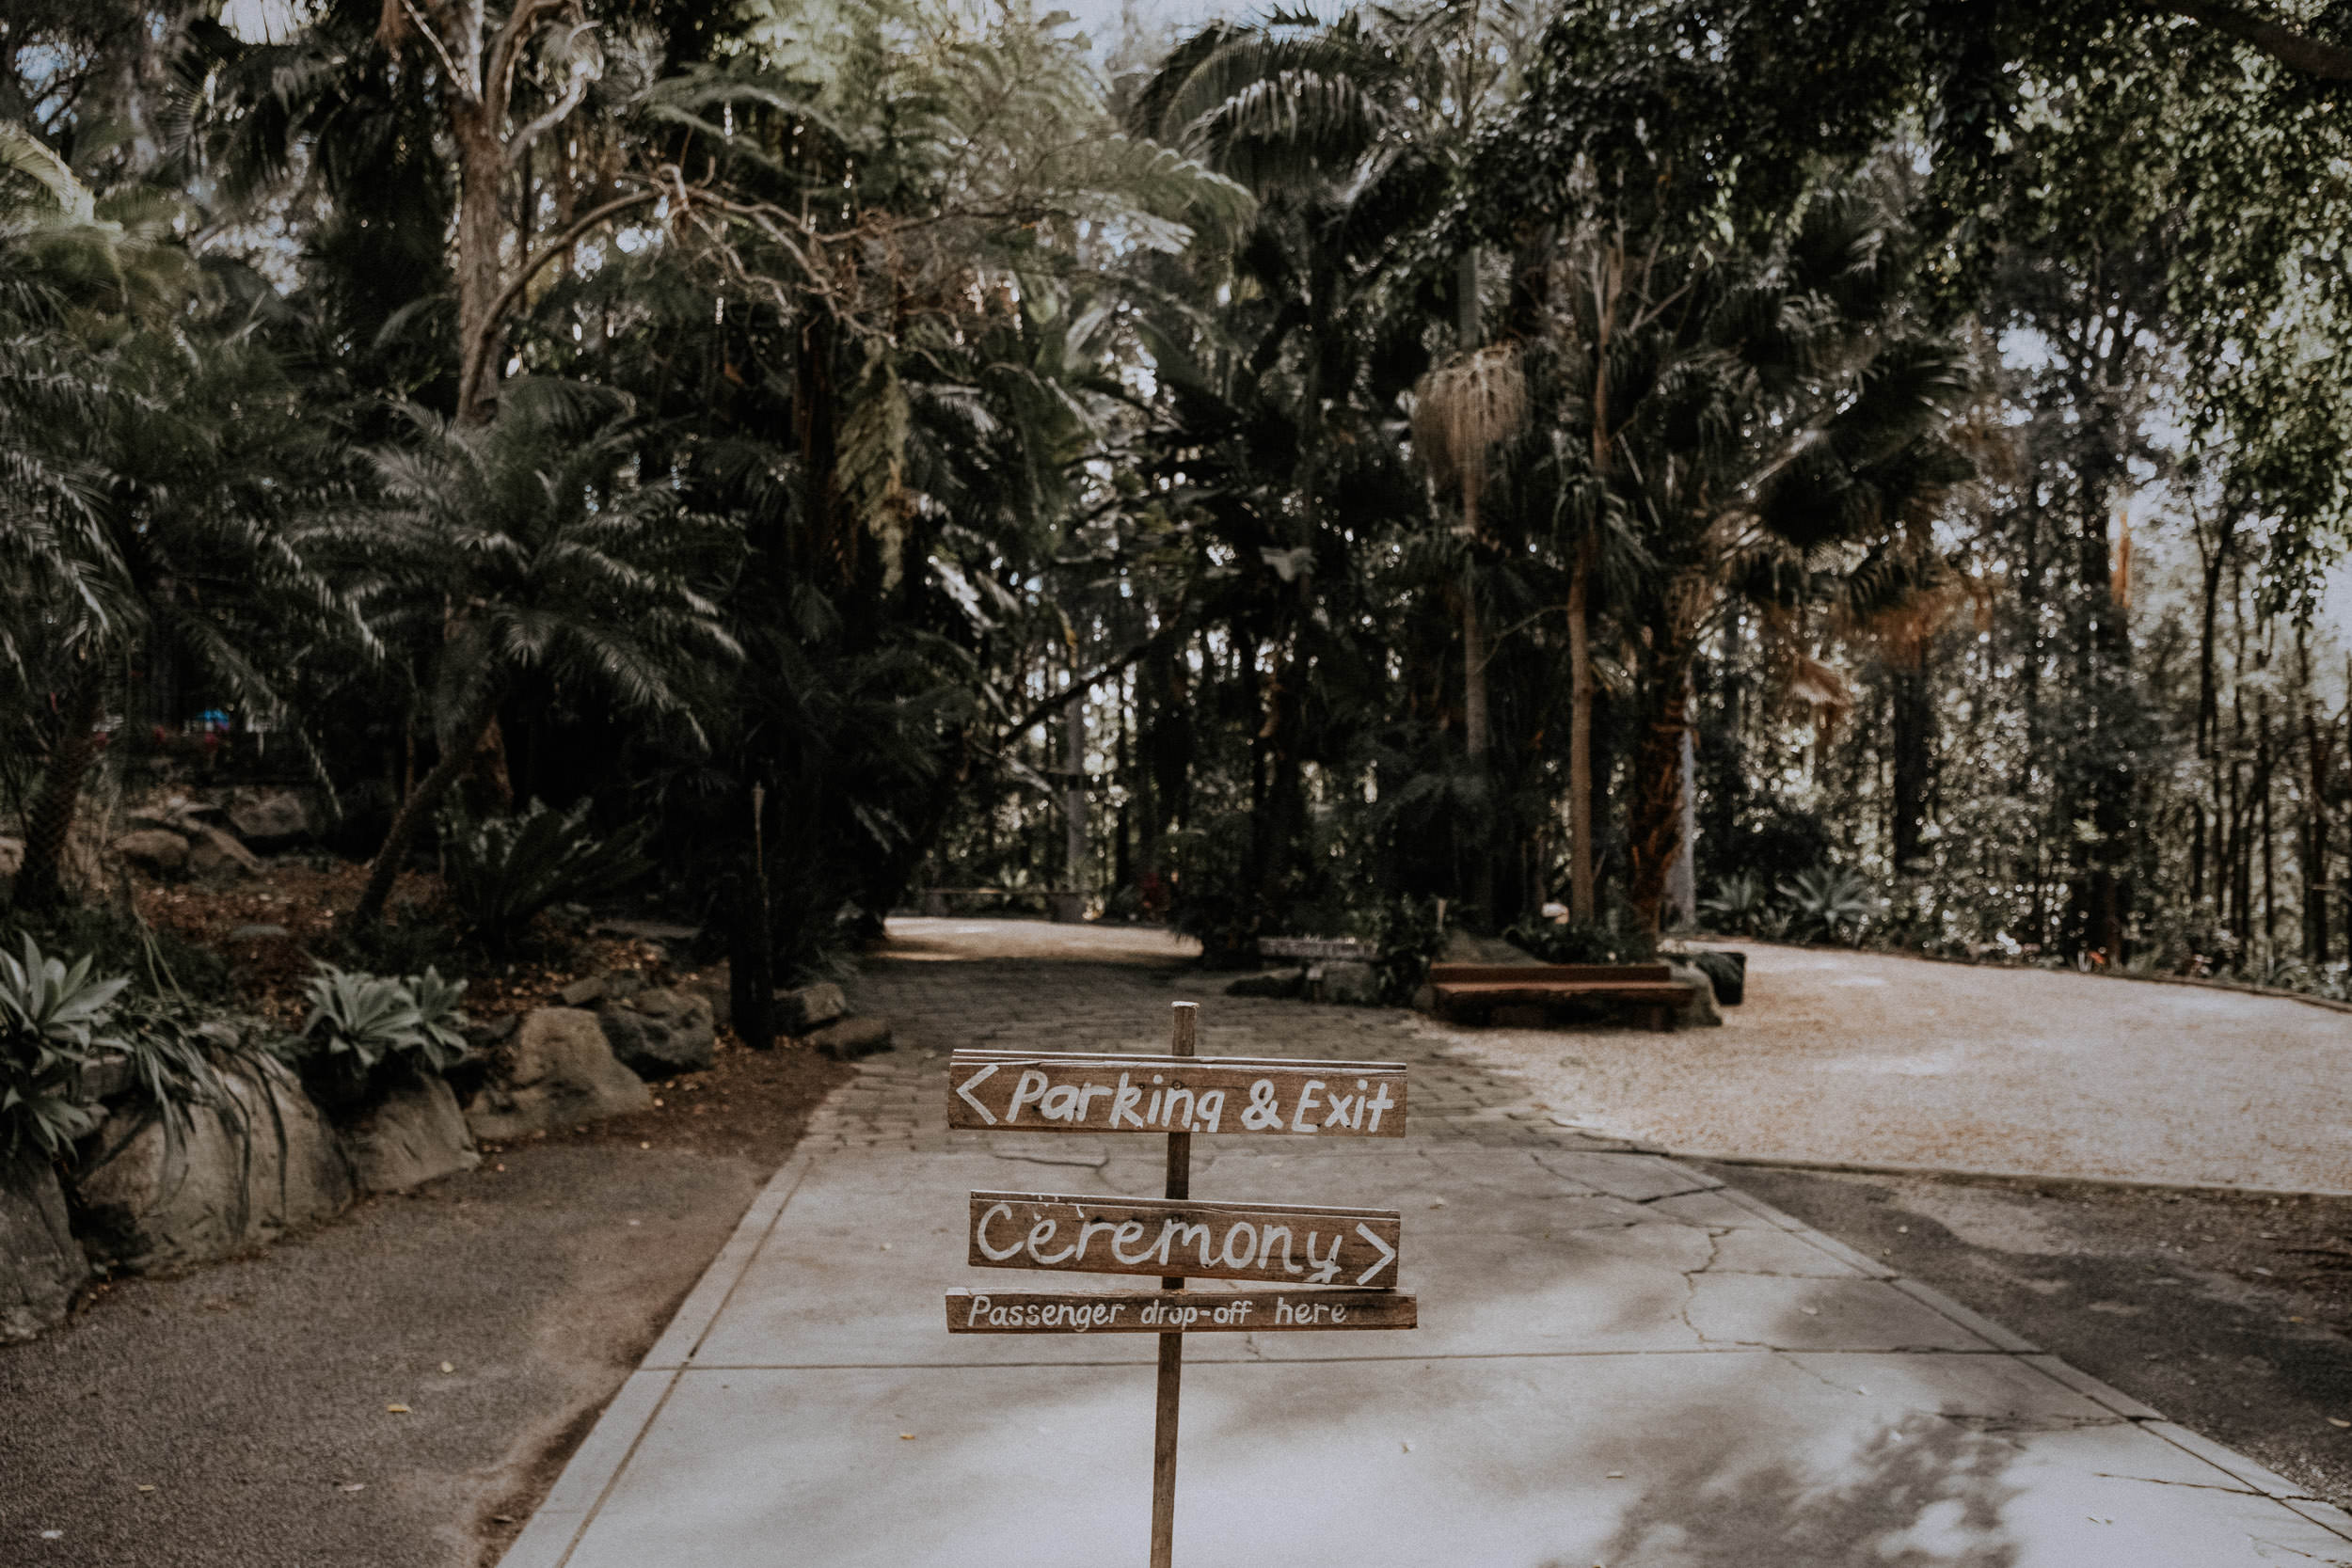 S&A Elopement - Kings & Thieves - Shred 'Til Dead - Central Coast Beach Forest Wedding - 136.jpg